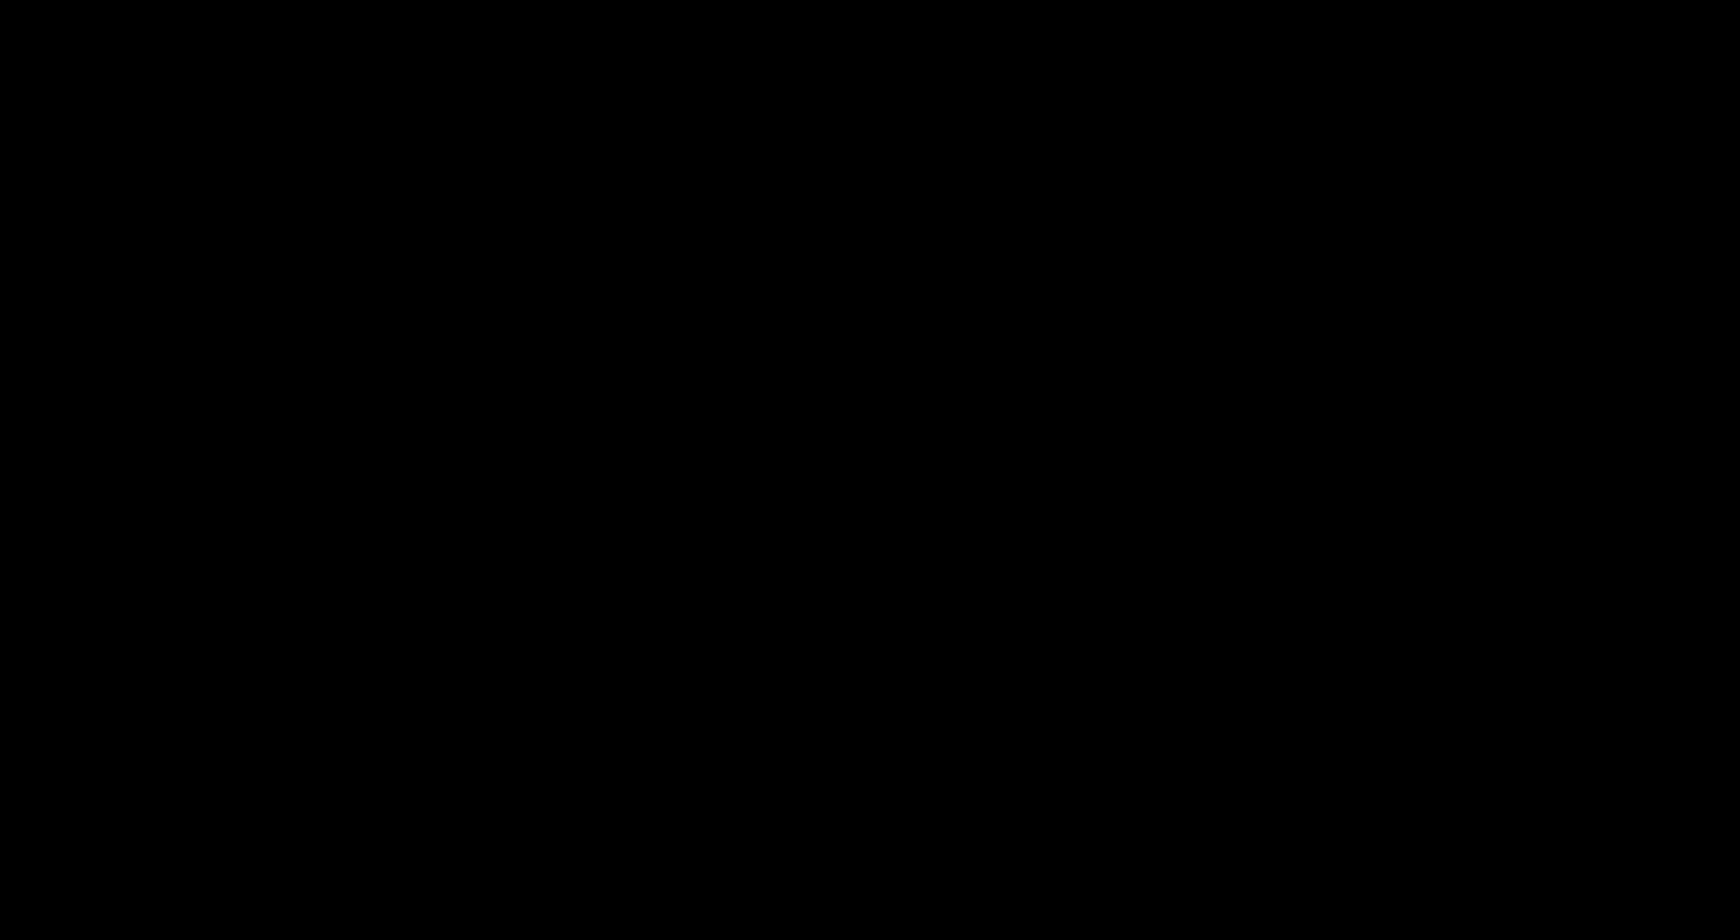 GonZo editorE